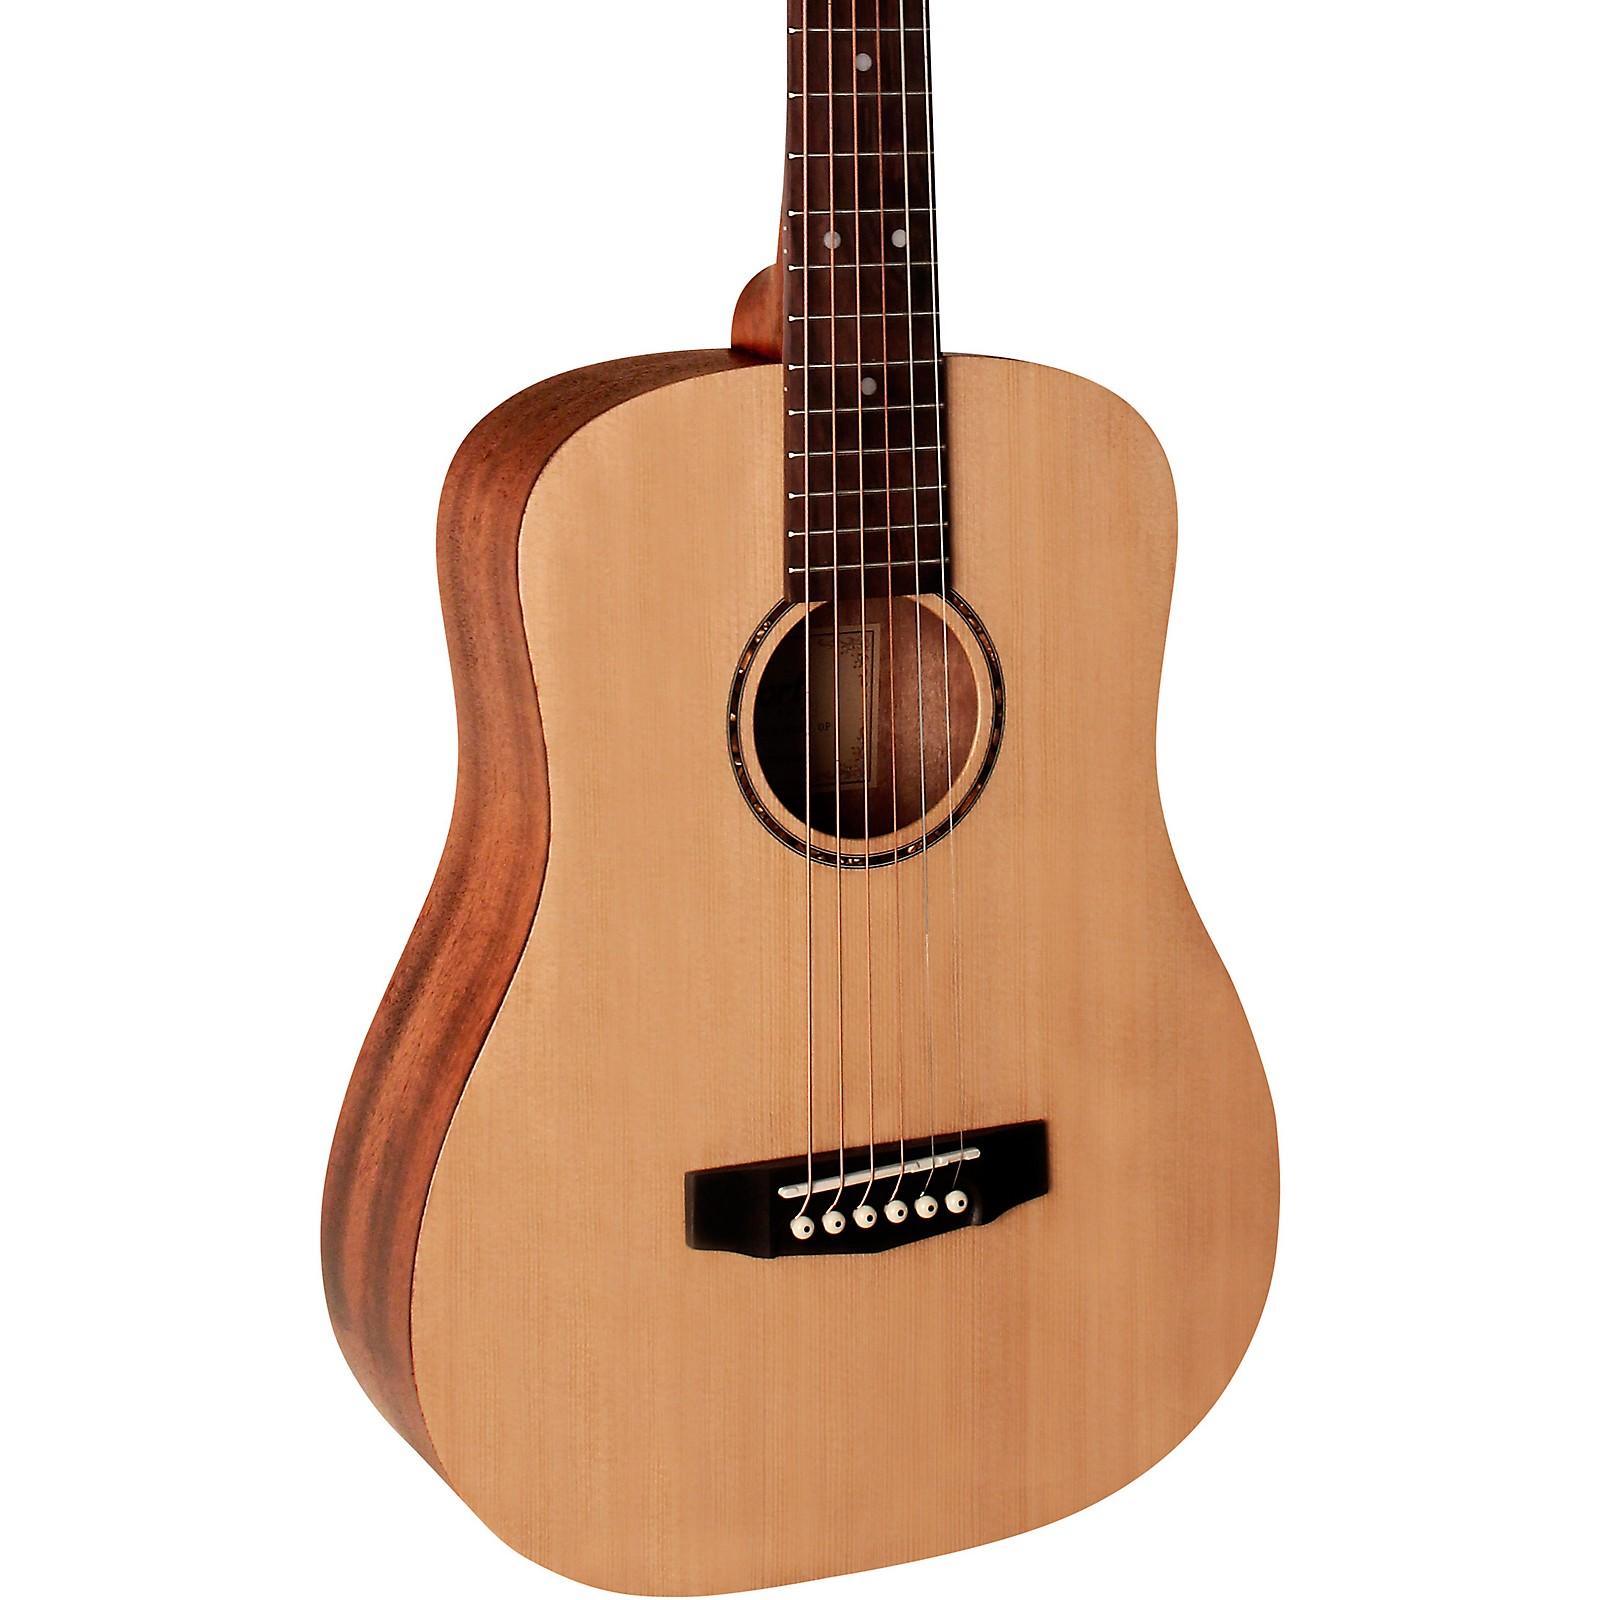 Cort AD mini OP Standard 3/4 Size Dreadnought Acoustic Guitar